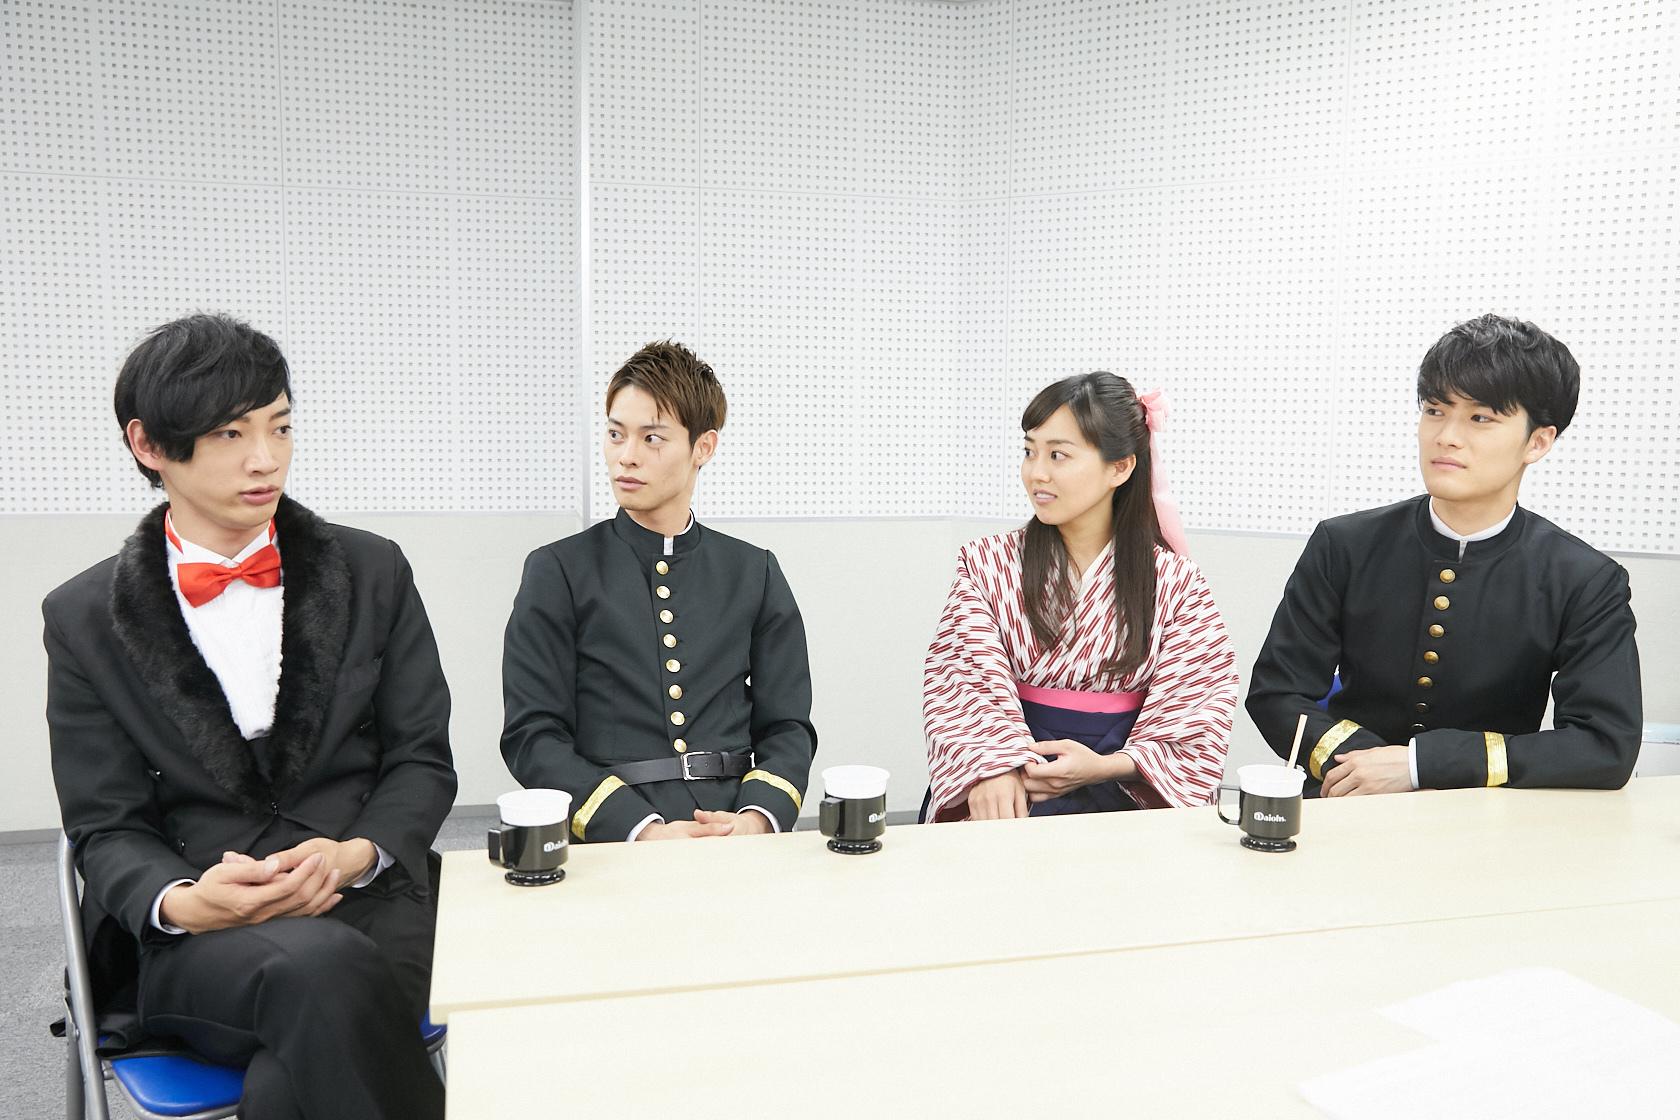 (左から)和合真一、宇野結也、宮﨑香蓮、入江甚儀